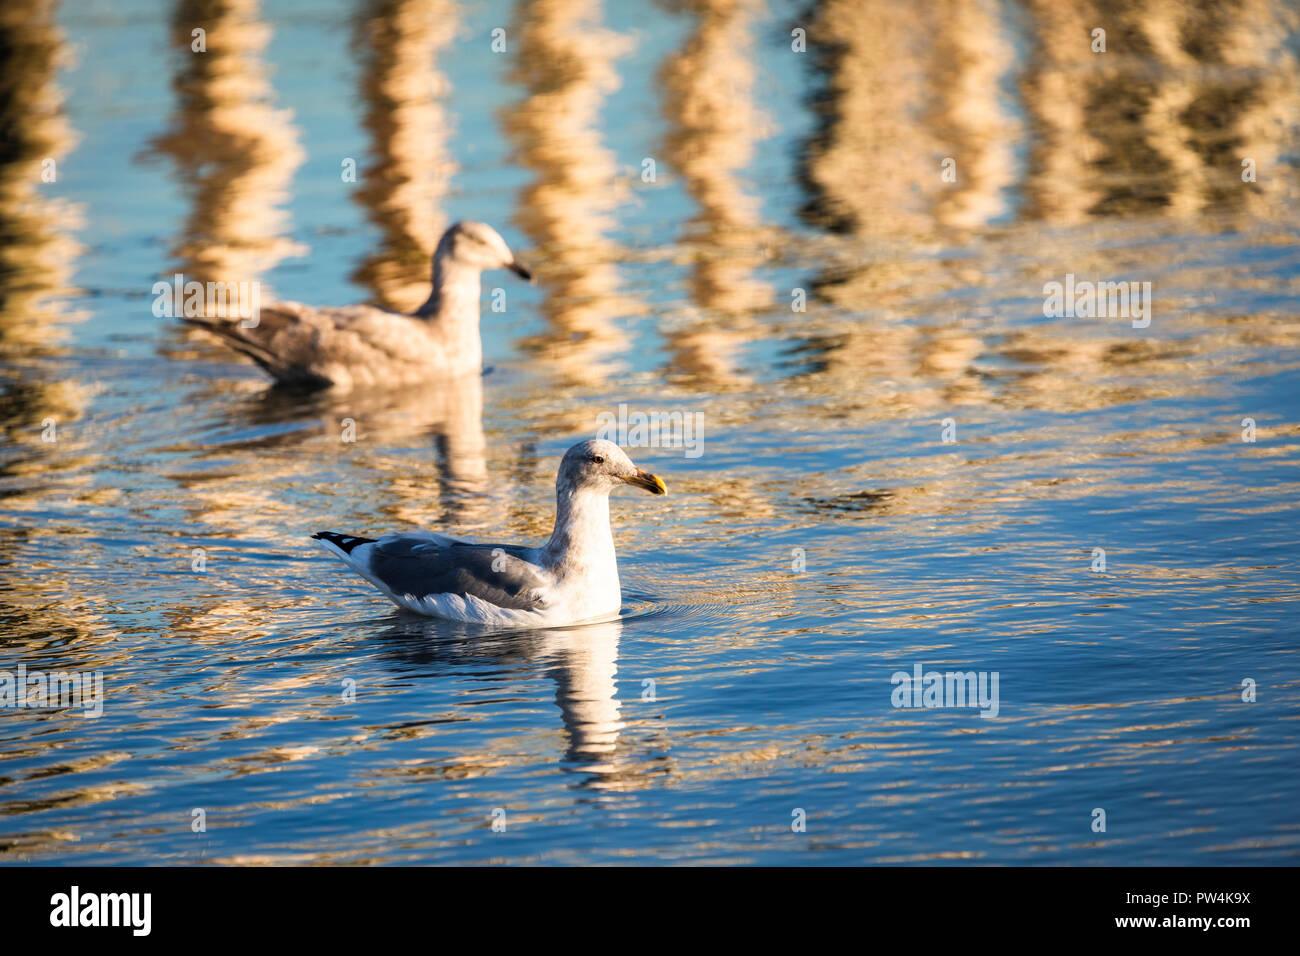 Seagulls swim near the pier outside of Garibaldi, Oregon, USA. - Stock Image